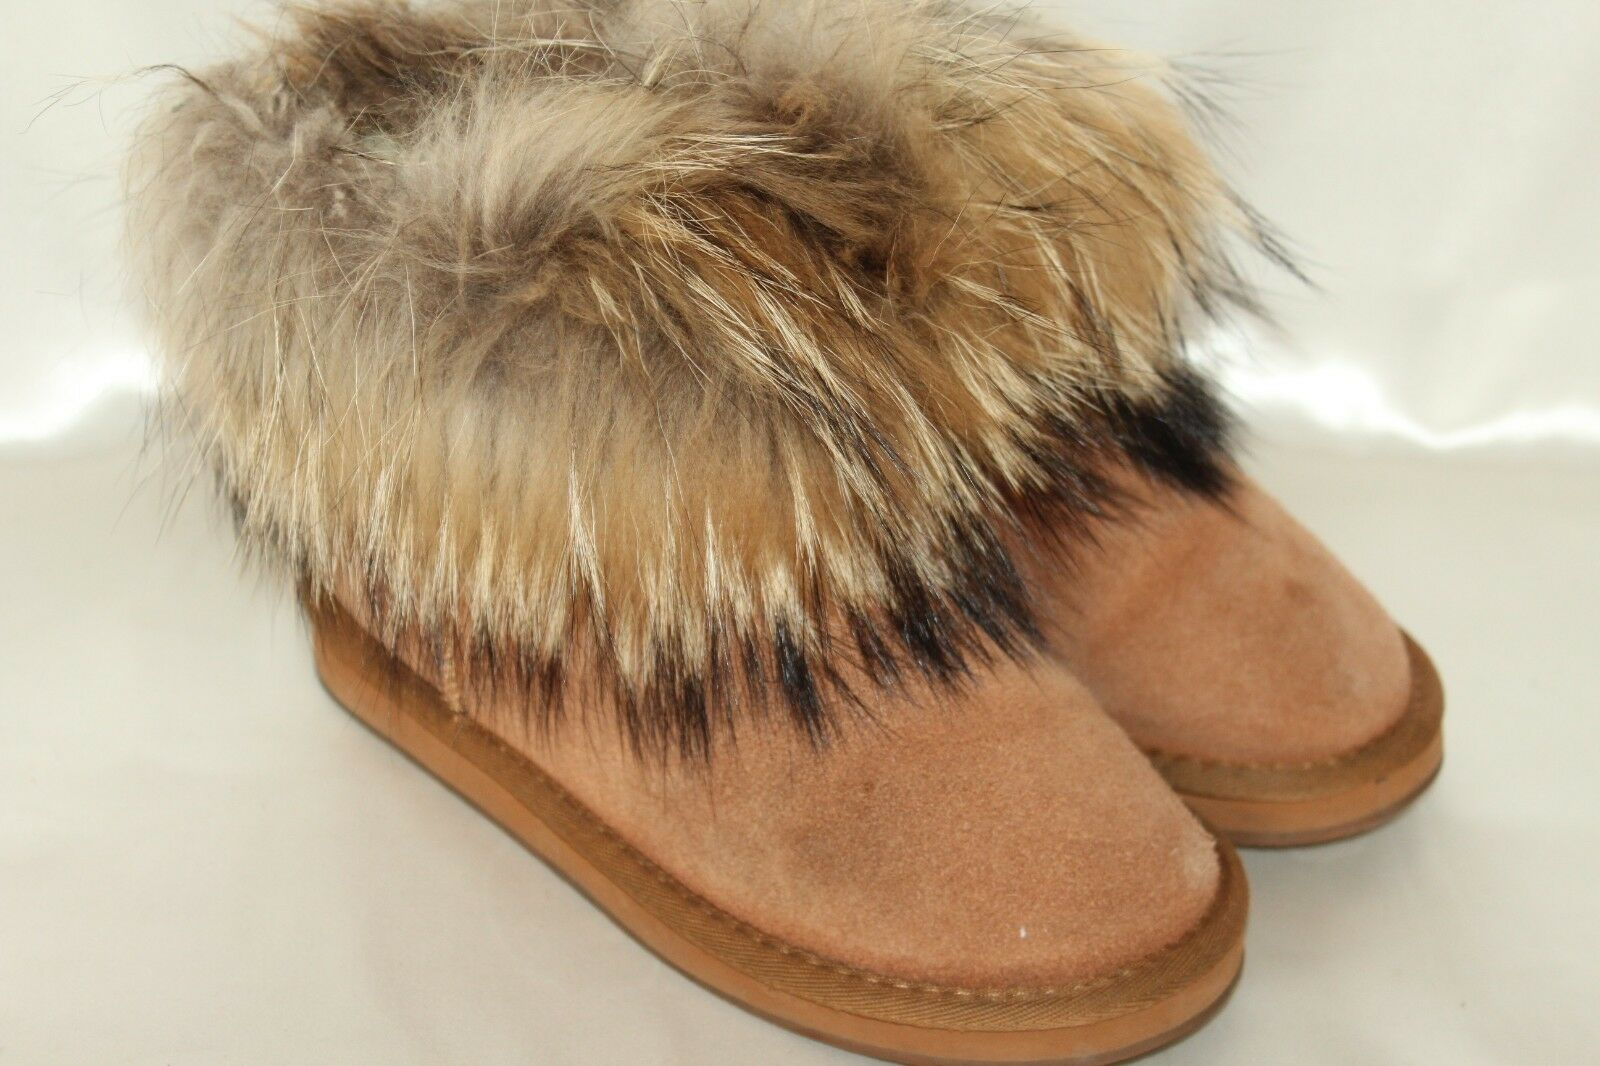 SNOW ELF Chestnut Suede Sheepskin Ankle Fur Cuff Ankle Boots Sz 7